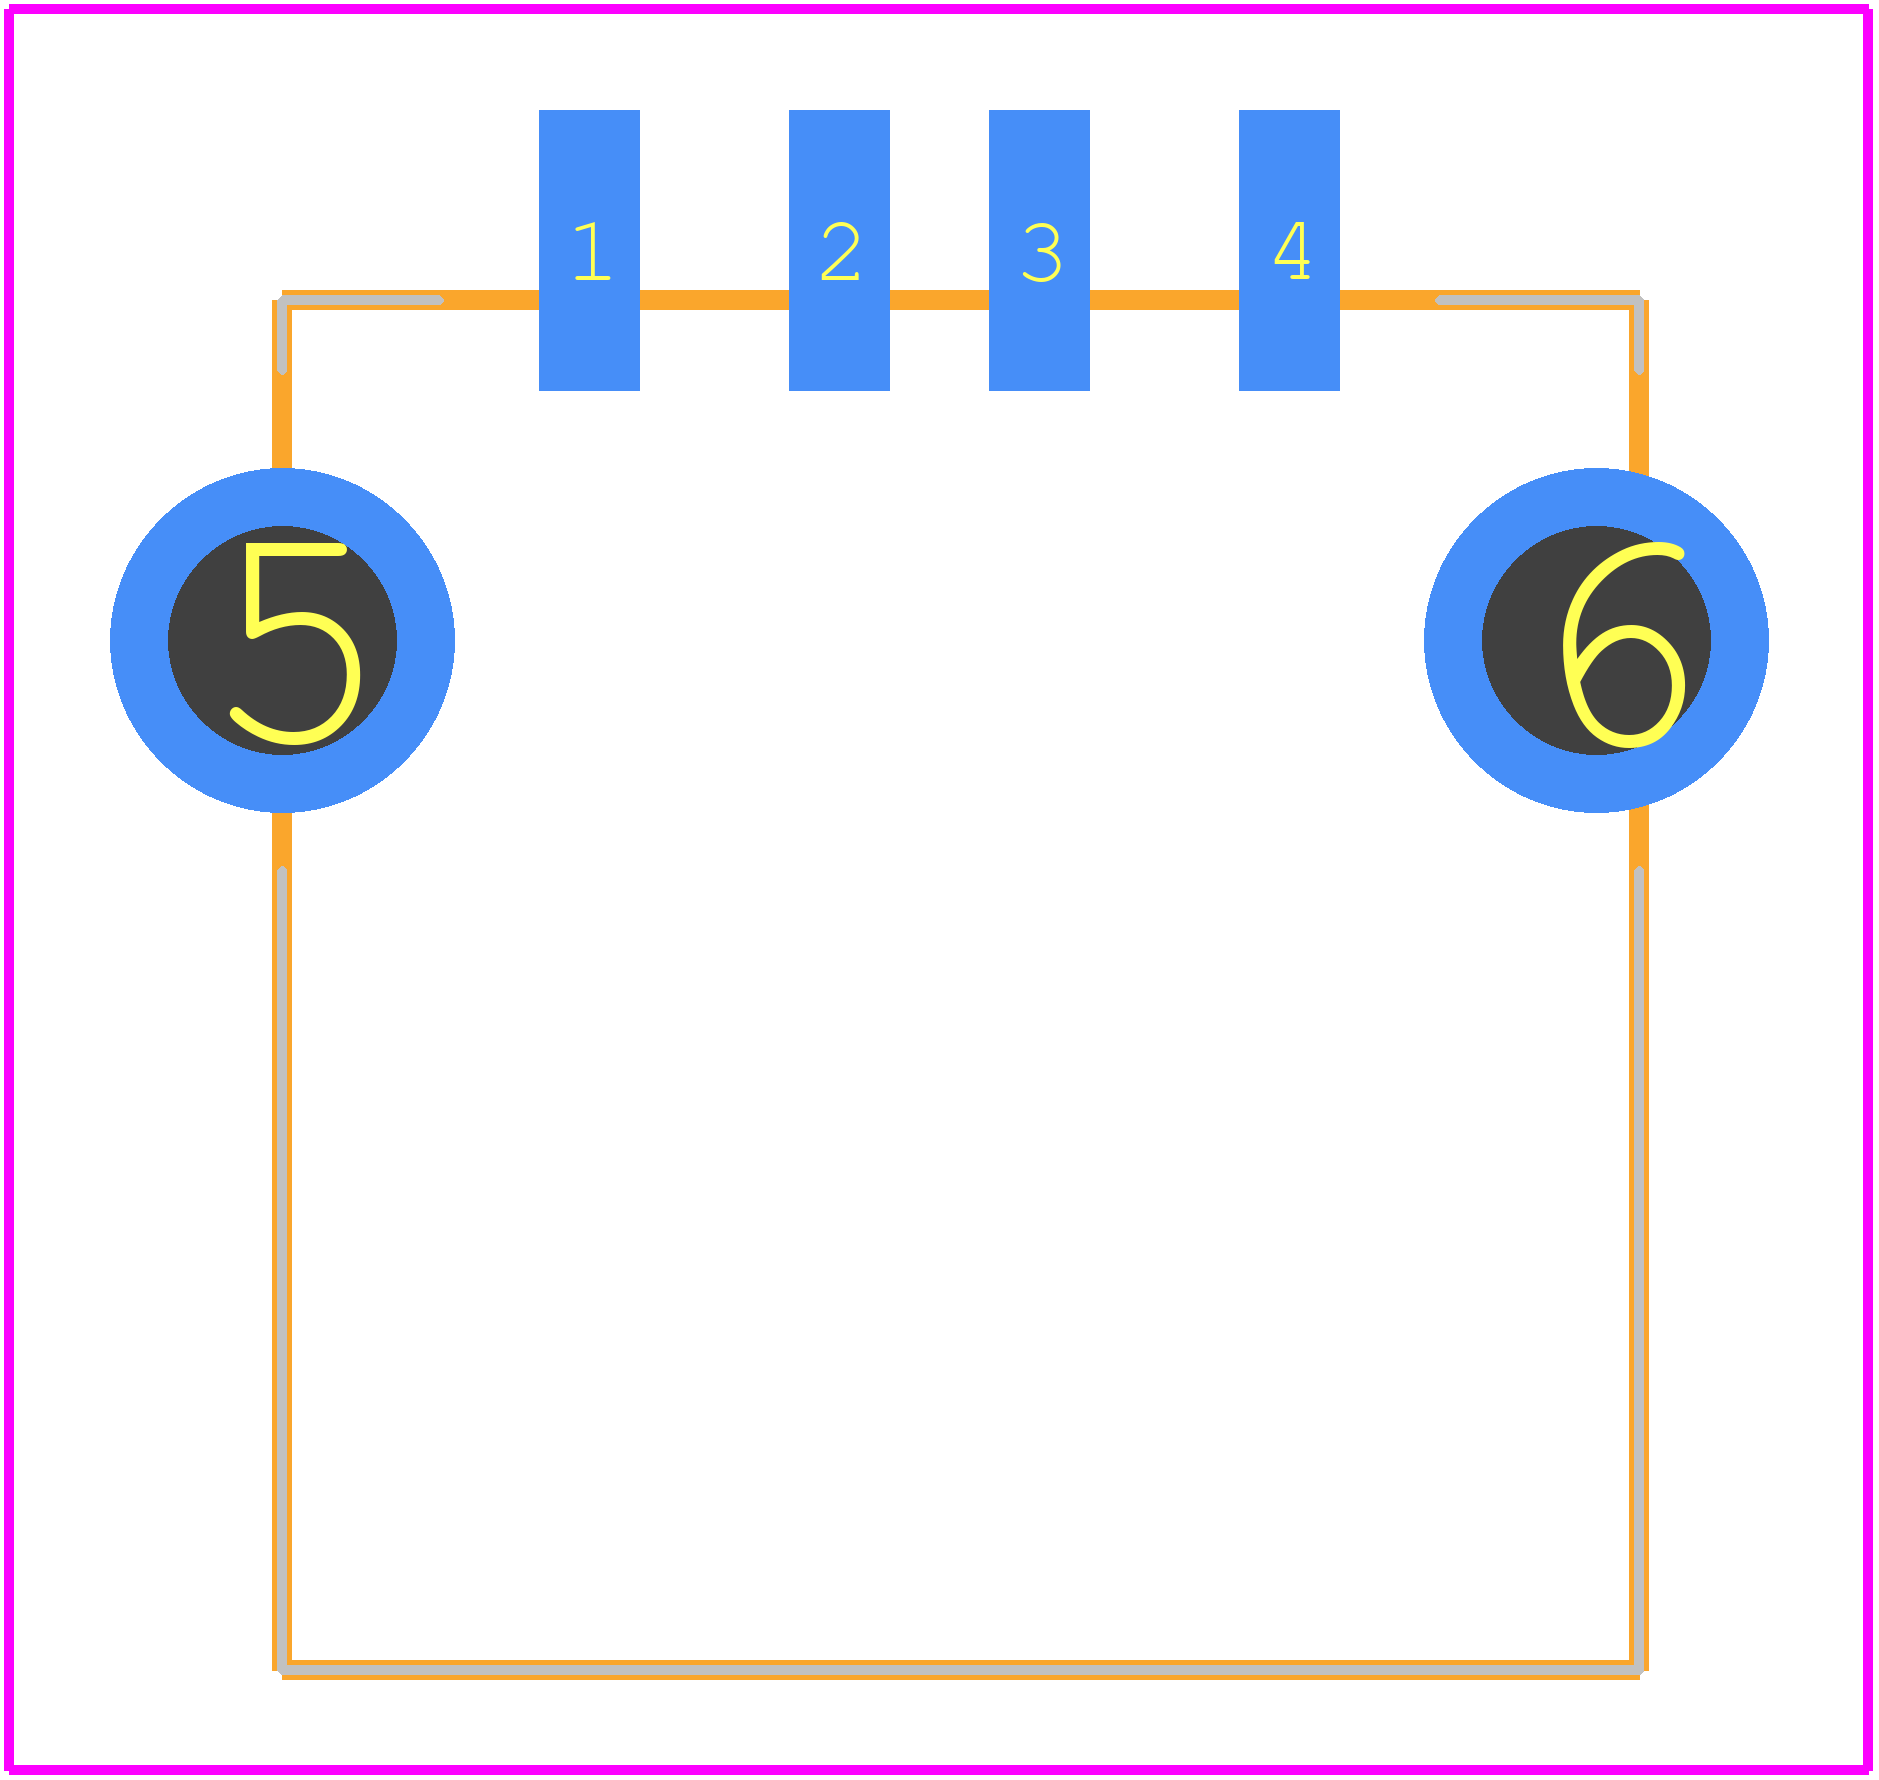 A-USB A/SMT - ASSMANN WSW components GmbH PCB footprint - Other -